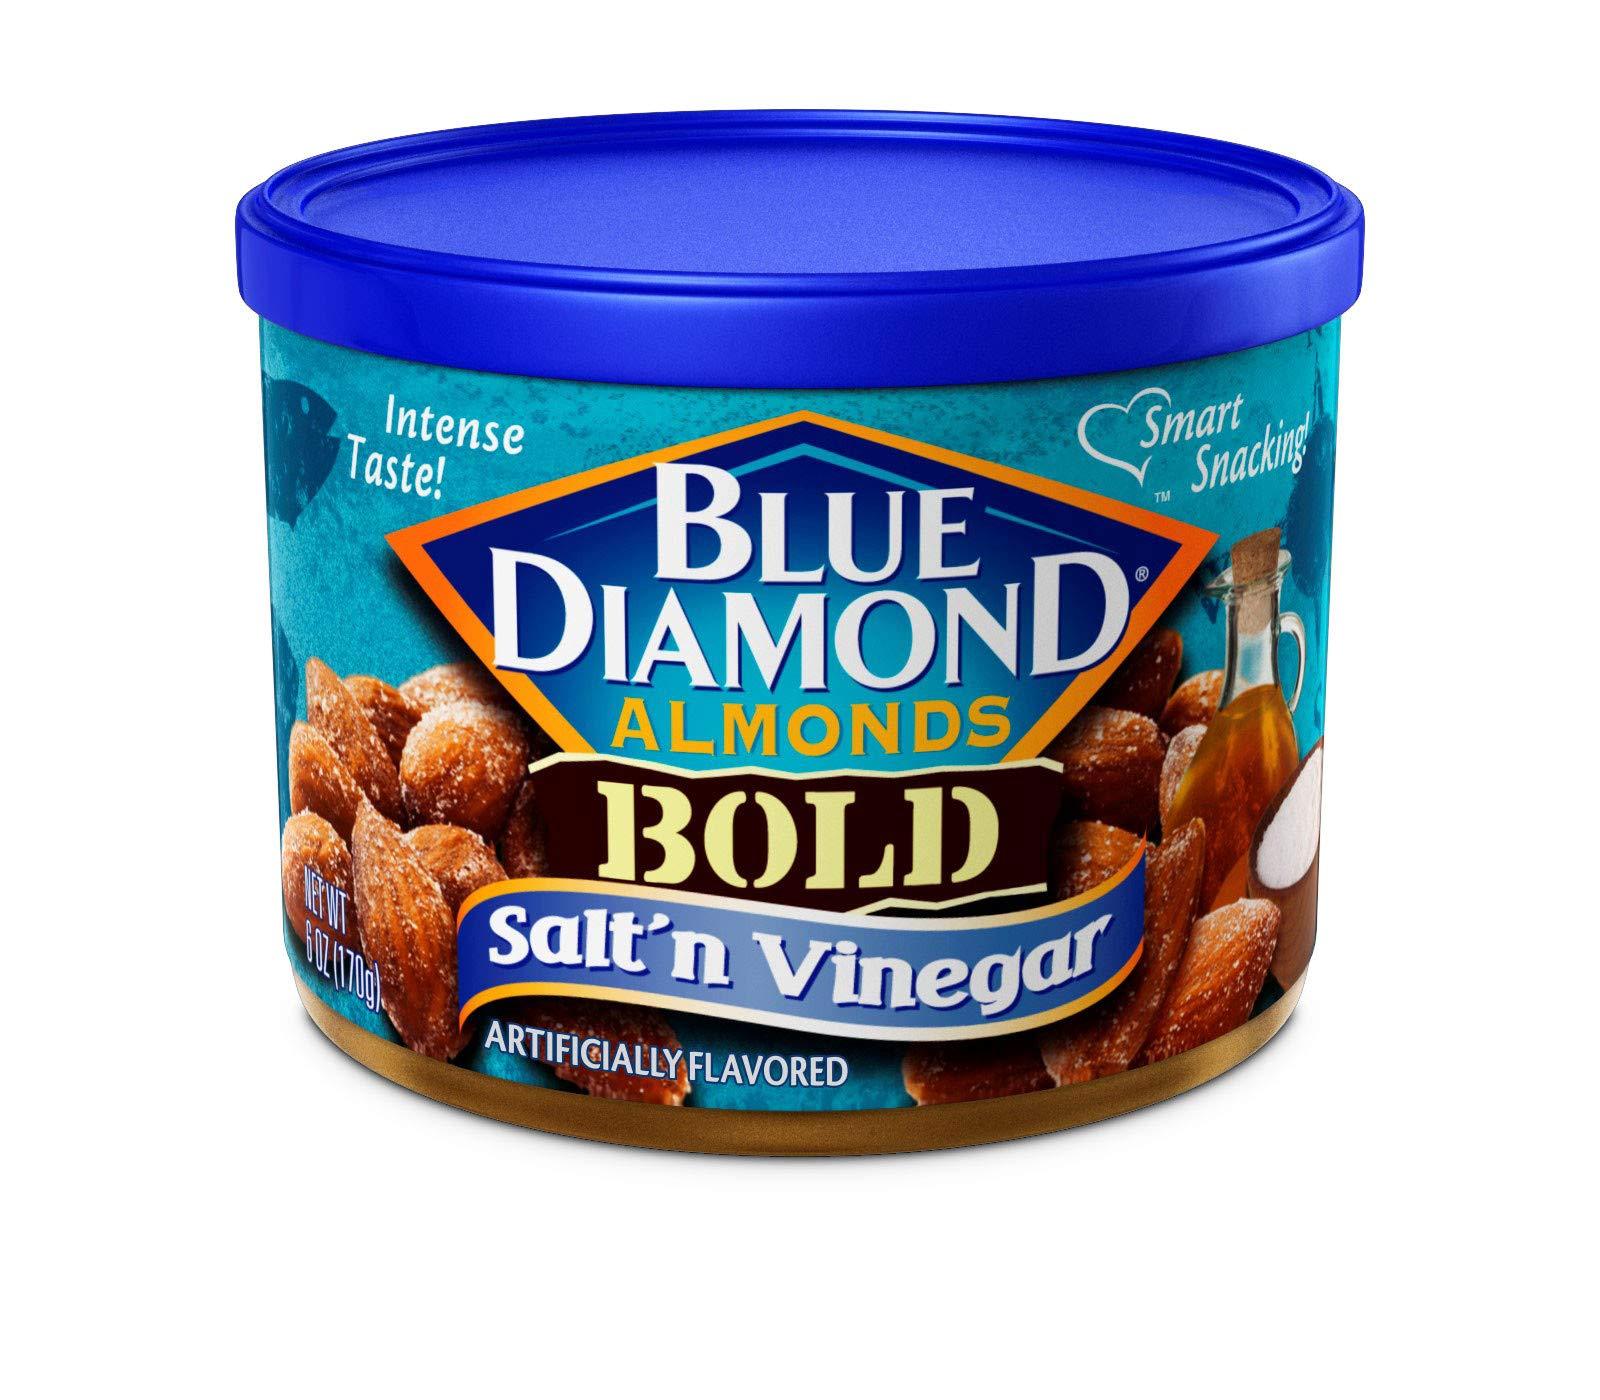 Blue Diamond Almonds, Bold Salt & Vinegar, 6 Ounce (Pack of 12) by Blue Diamond Almonds (Image #1)